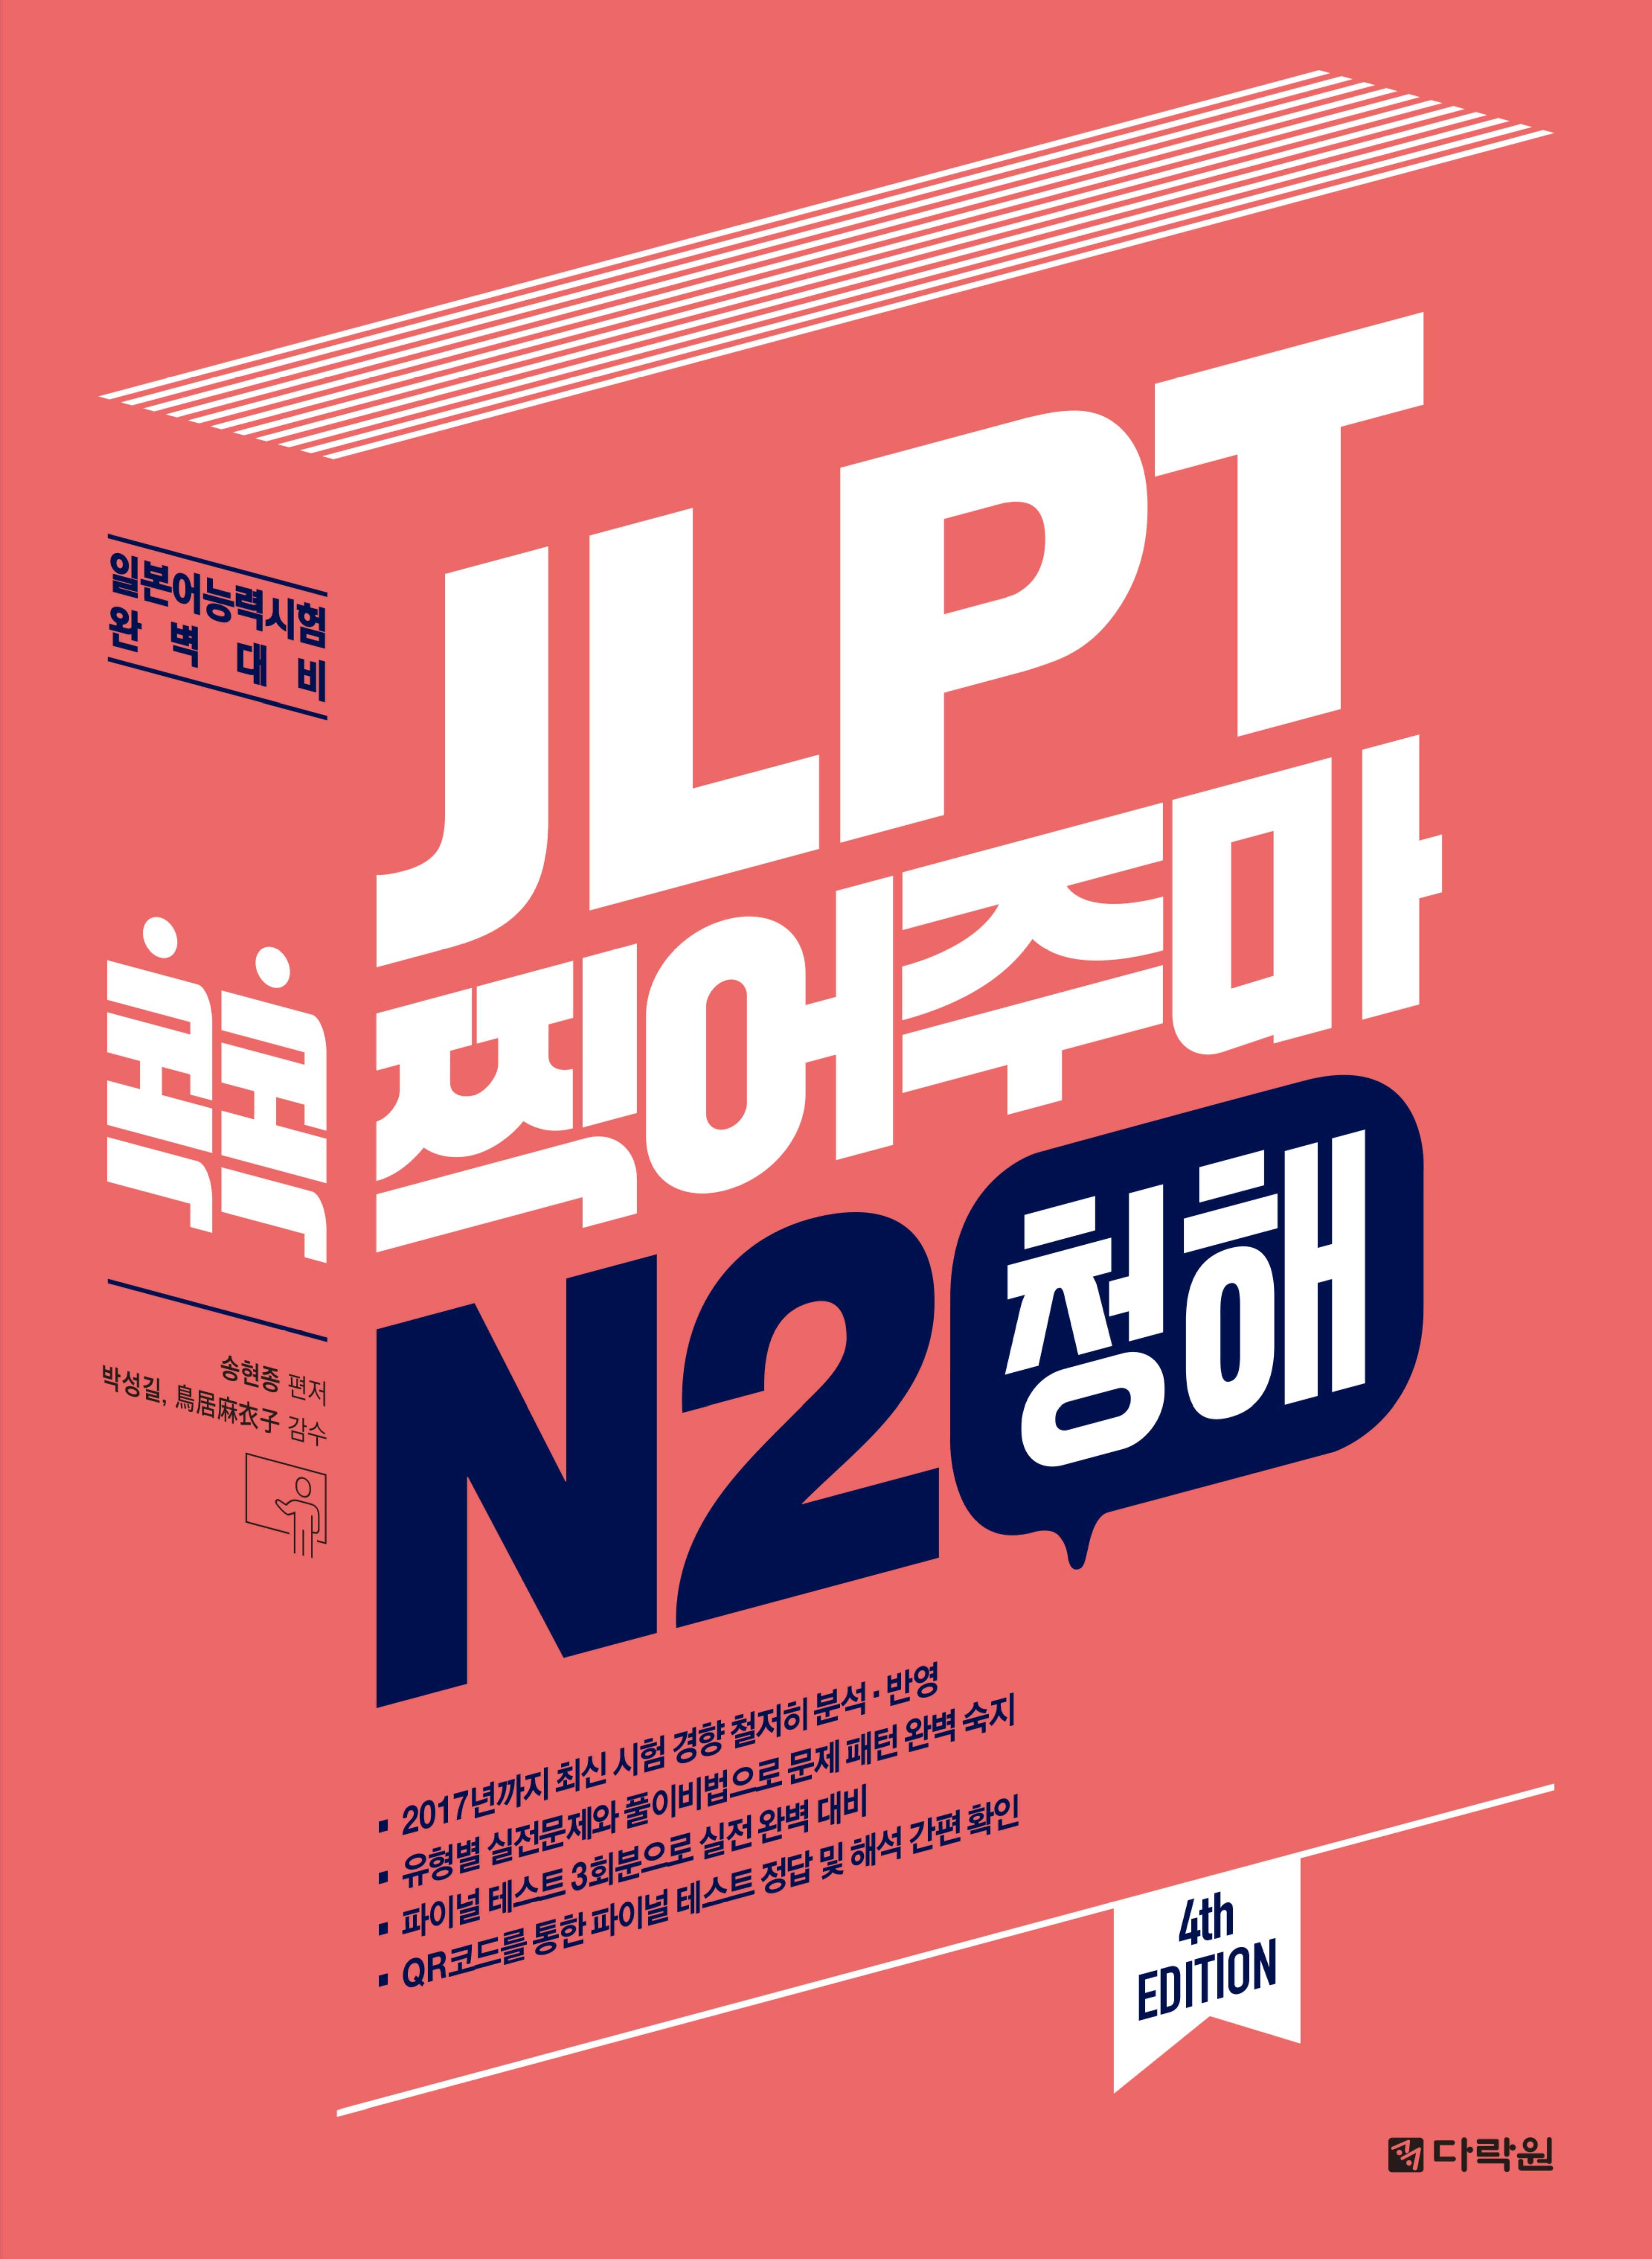 [JLPT 콕콕 찍어주마] (4th EDITION) JLPT 콕콕 찍어주마 N2 청해